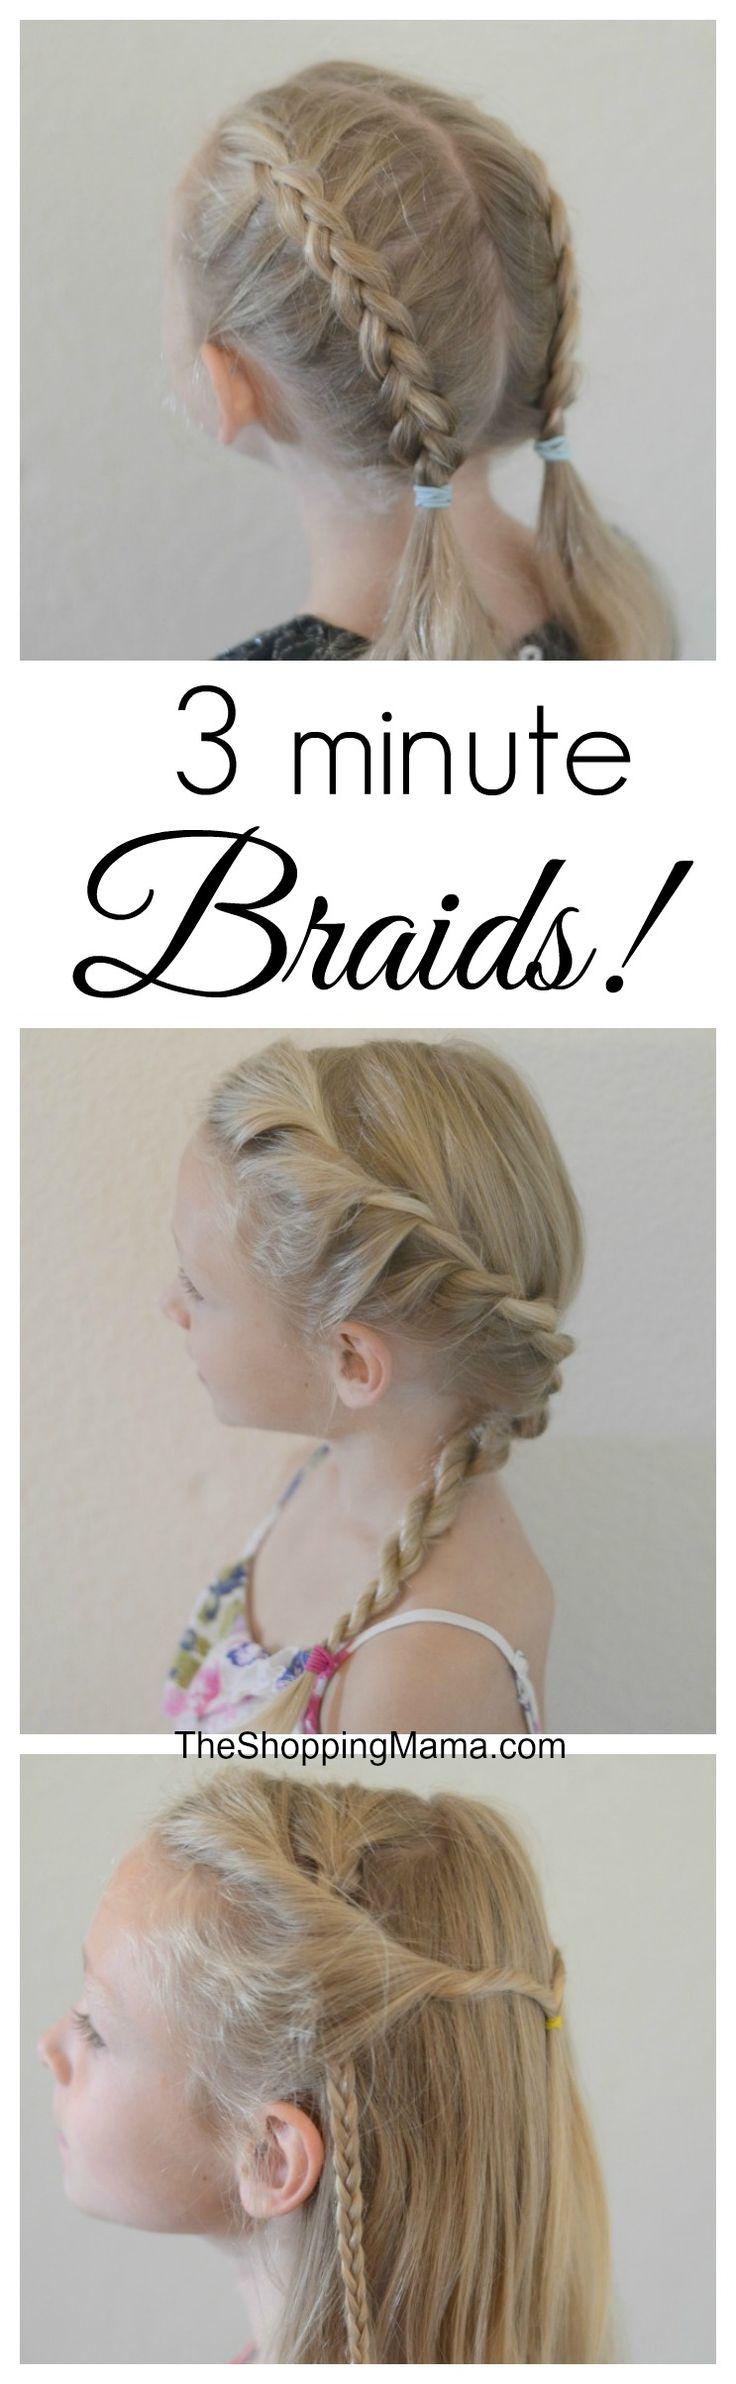 Easy Back-to-School Hair-Braid Tutorials - | The Shopping MamaThe Shopping Mama